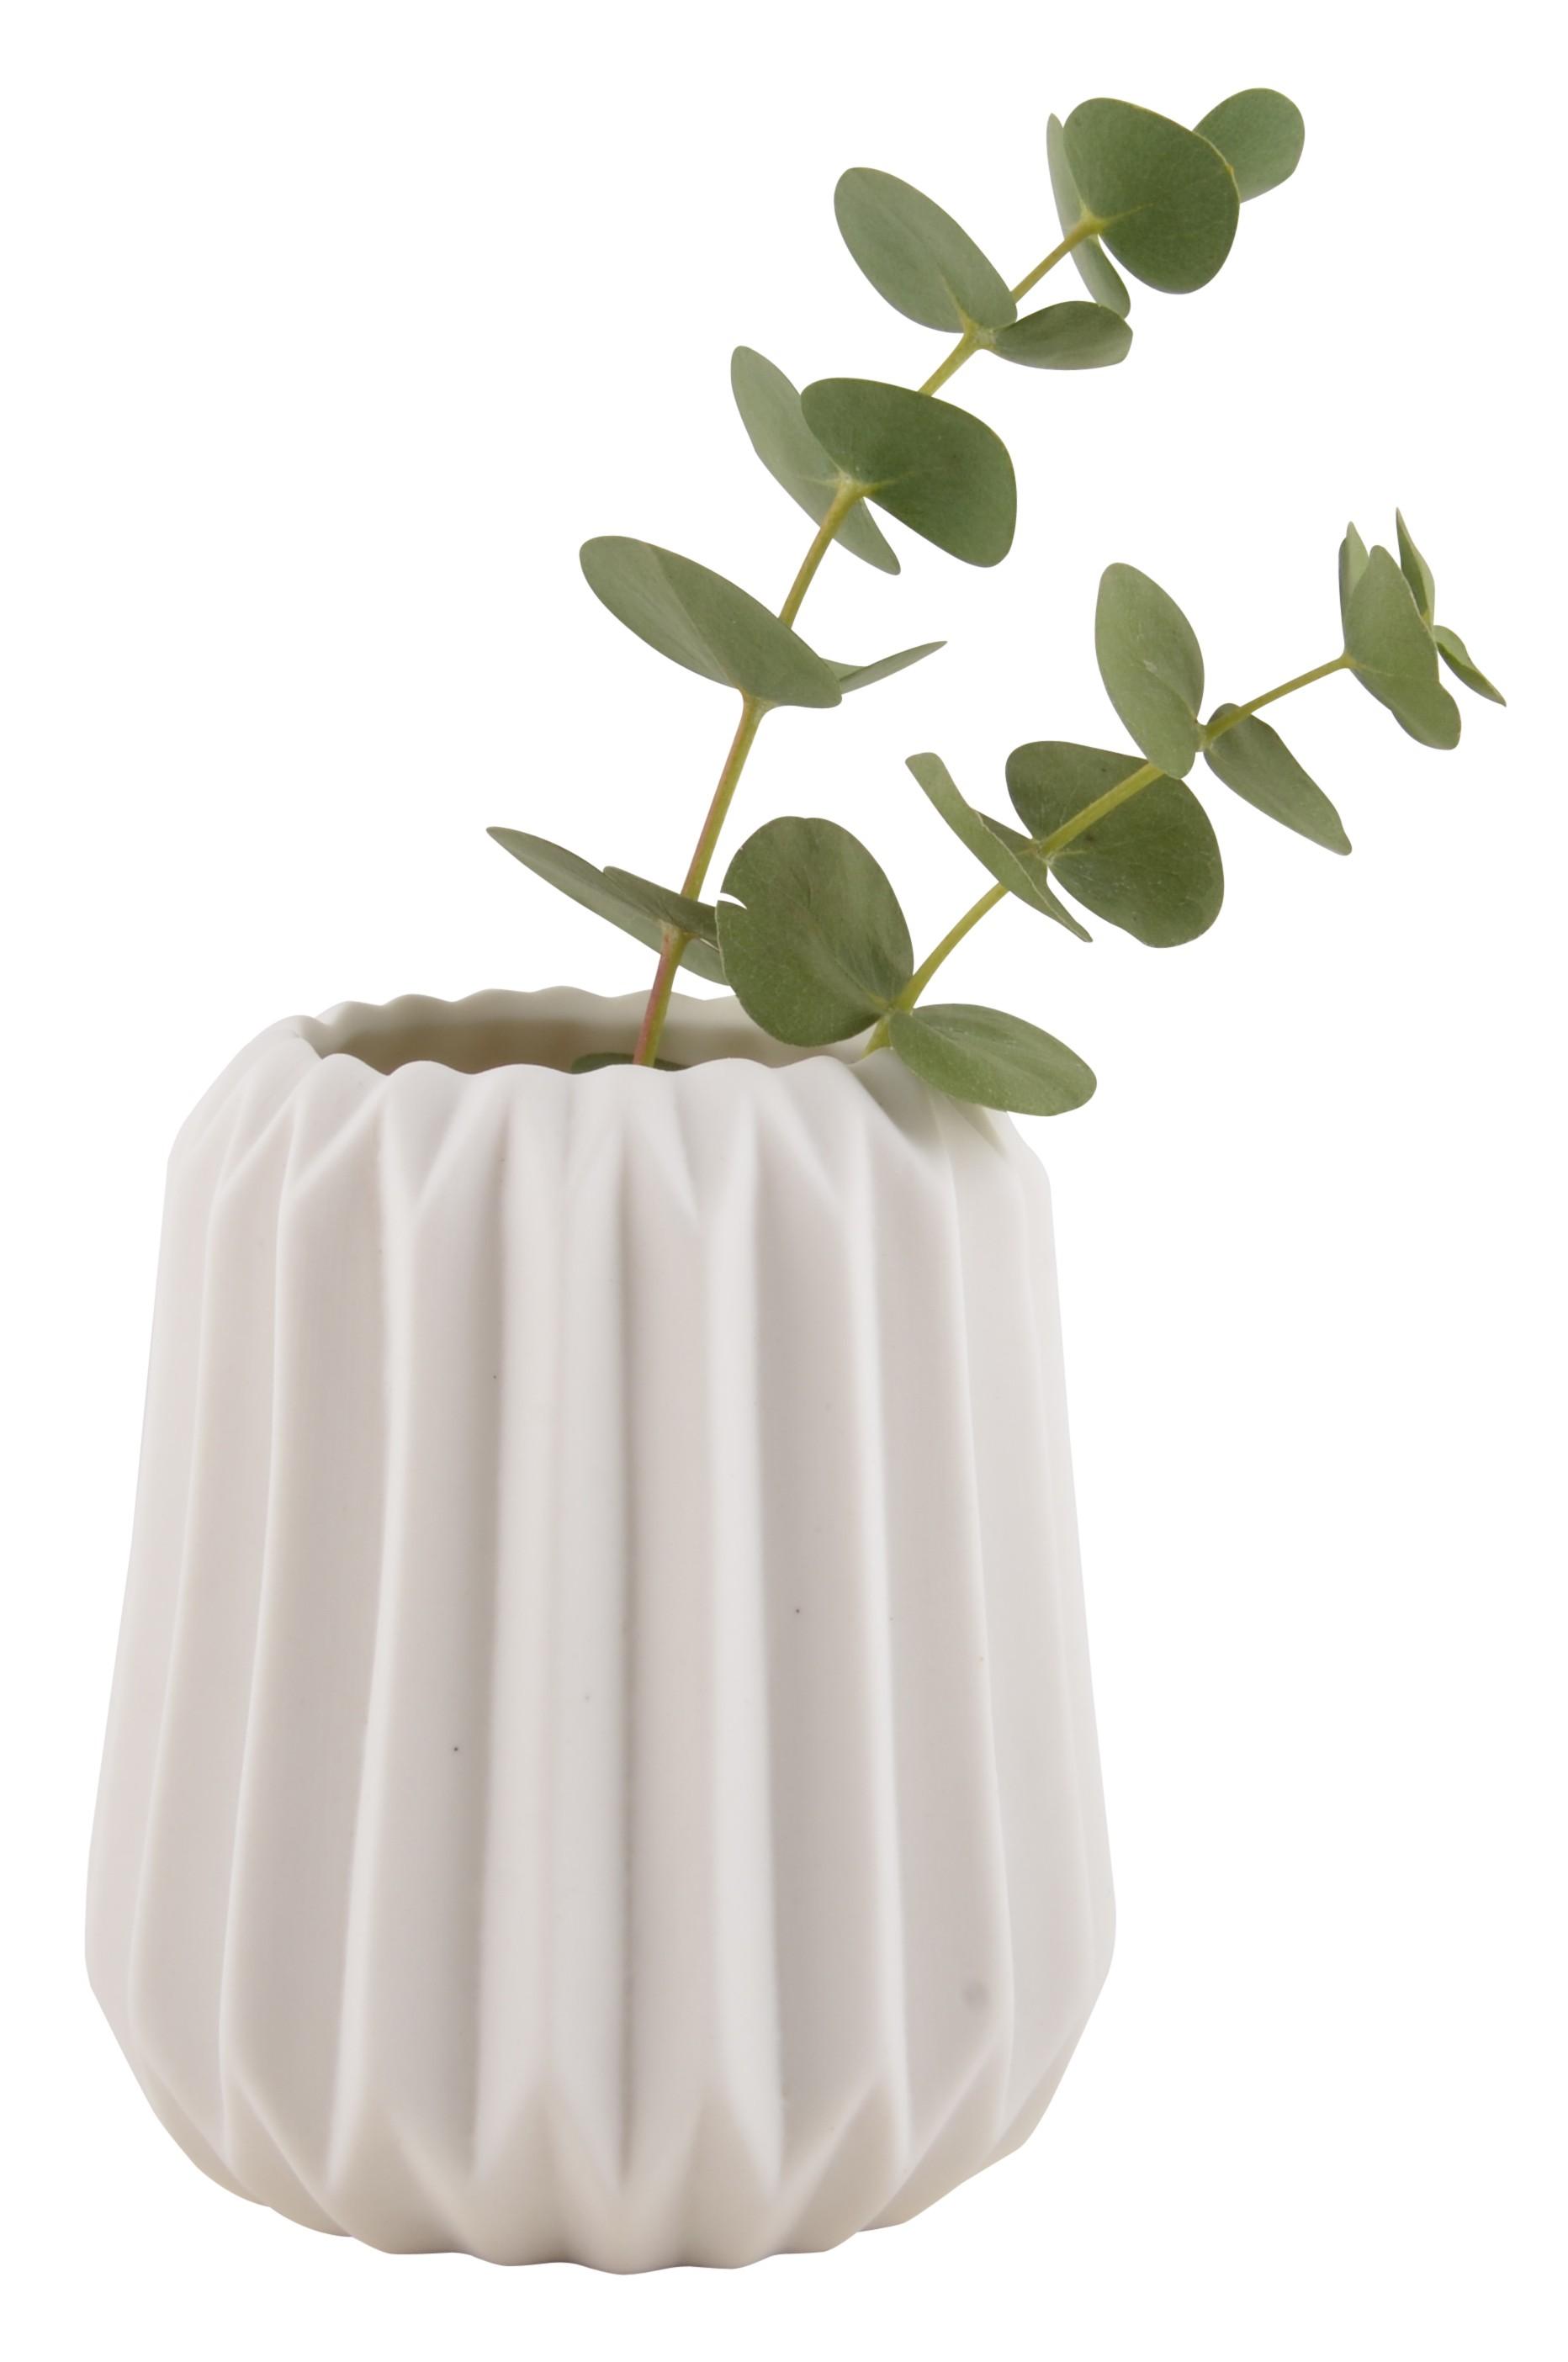 Small White Fluted Gabriella Nordic Design Vase by Ib Laursen